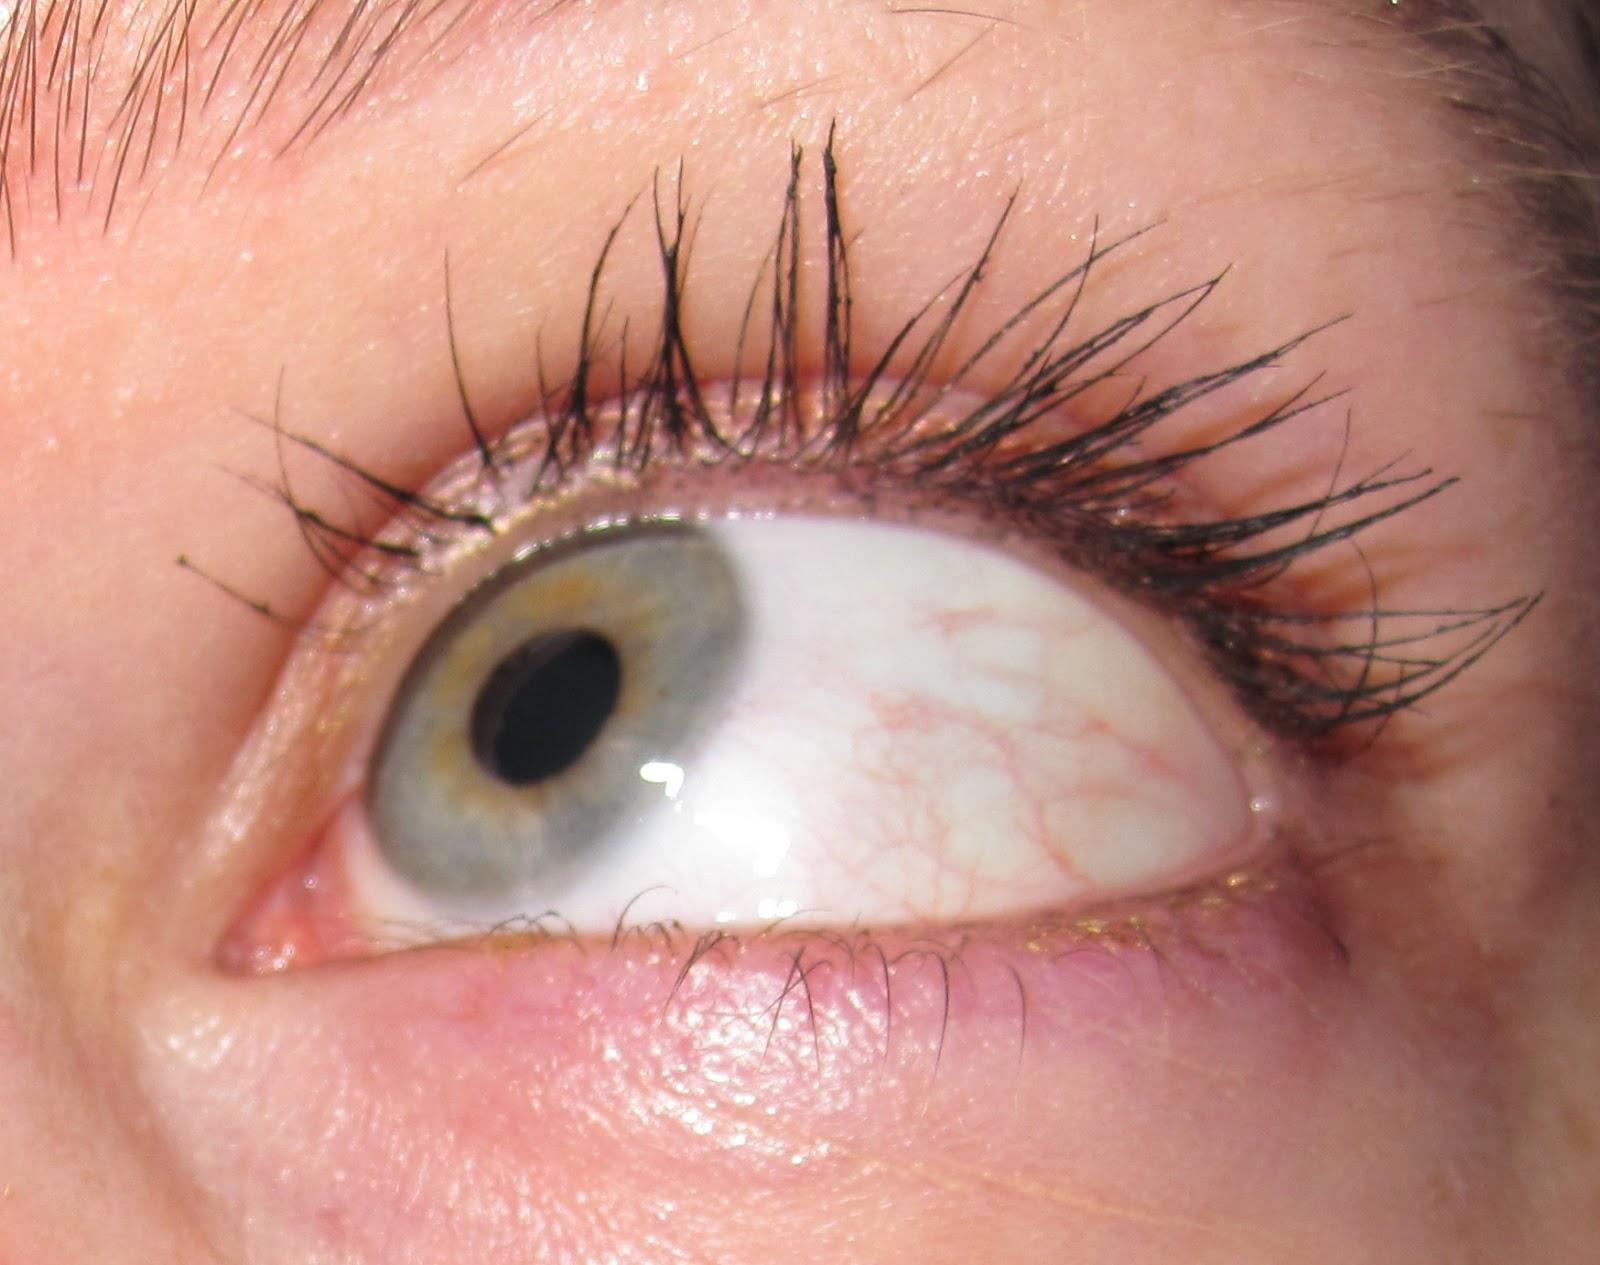 Eye Symptoms: What Are Bloodshot Eyes A Symptom Of